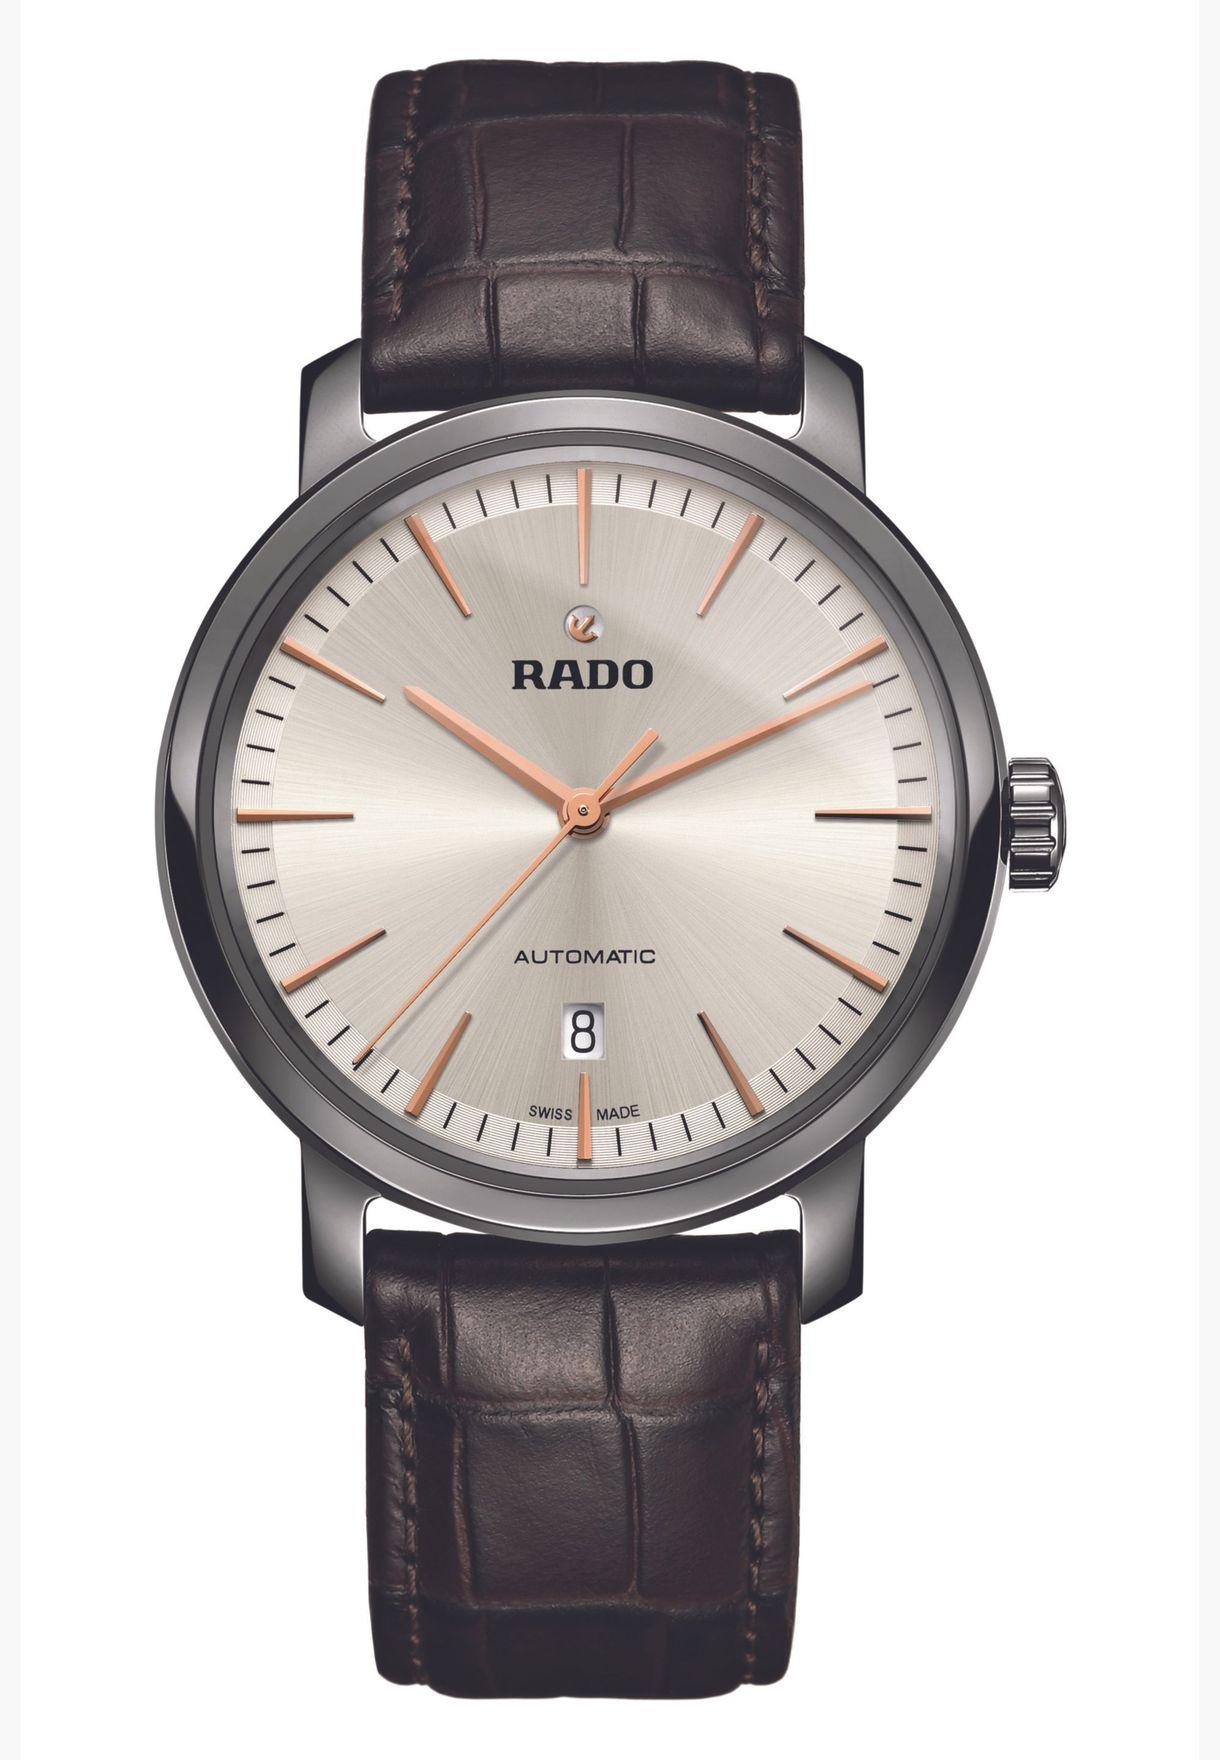 ساعة رادو دياماستر للرجال - R14074086